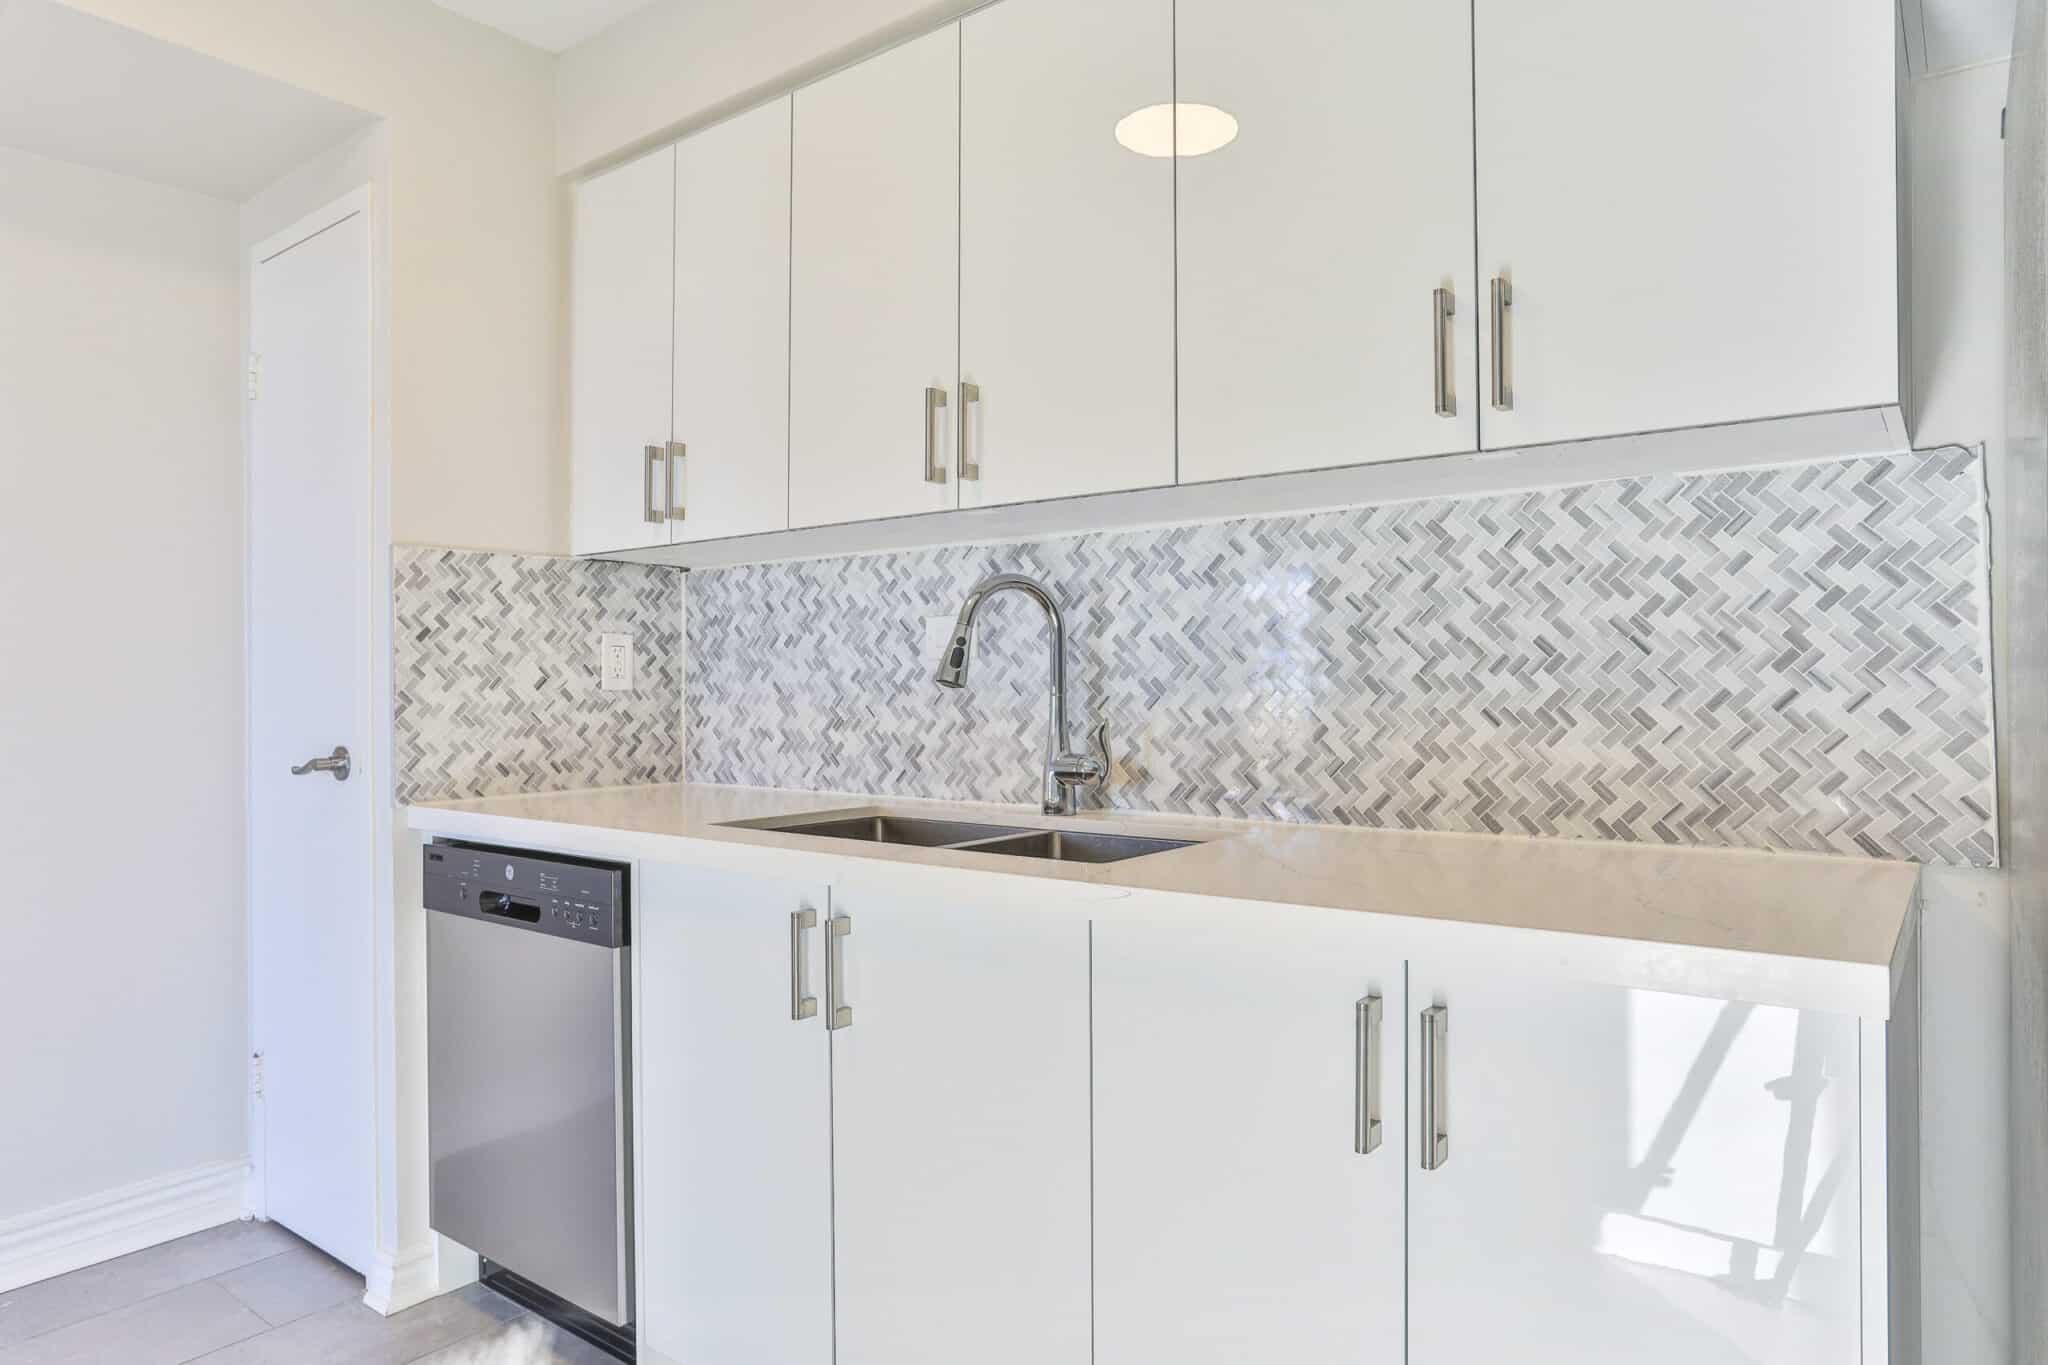 Penthouse Renovated White Kitchen with Quartz Counter